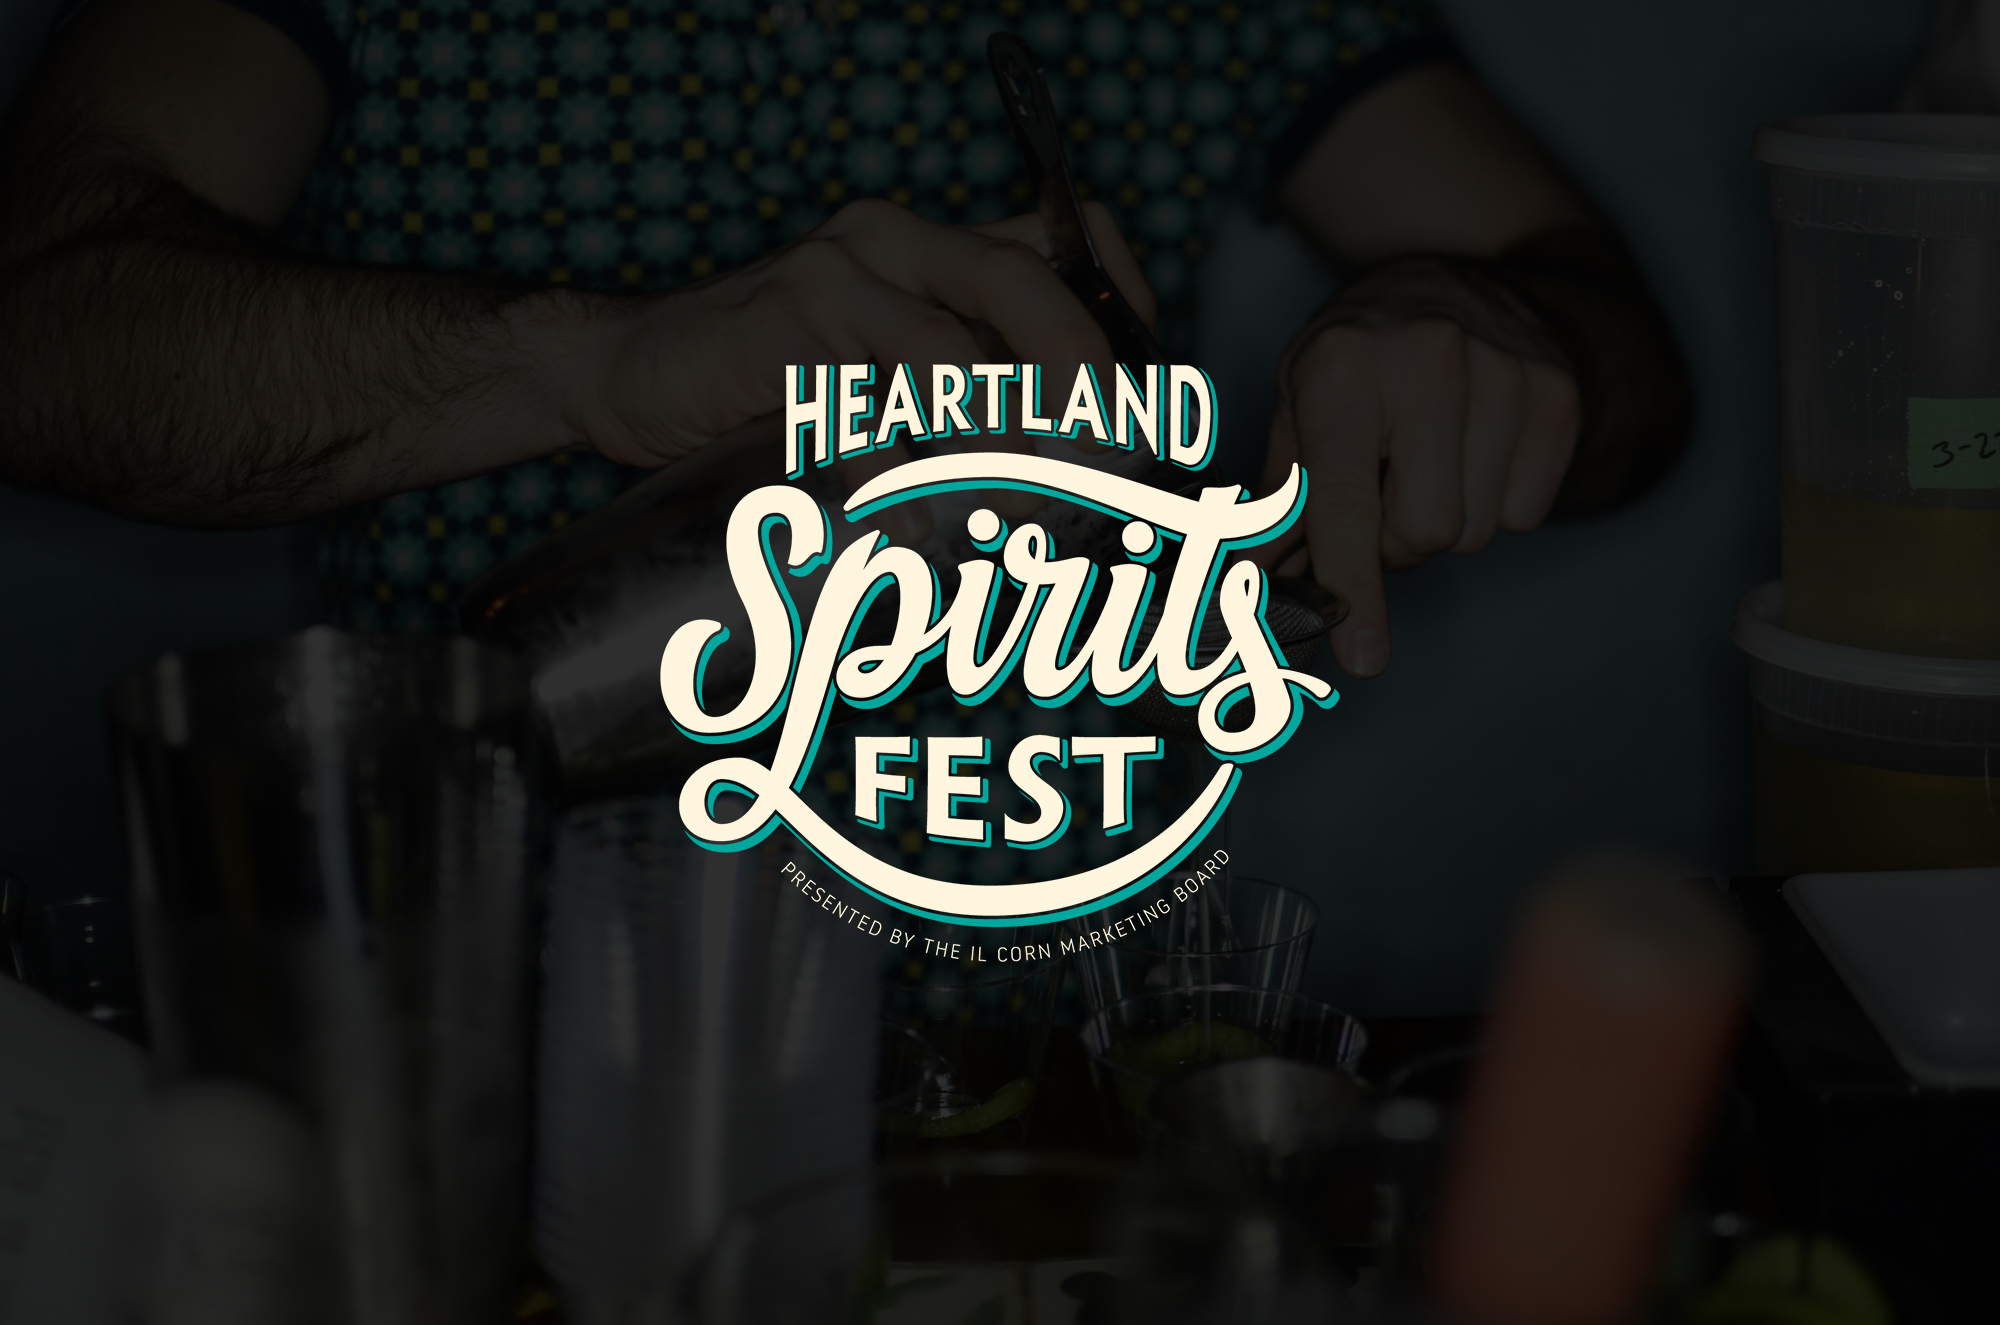 Heartland Spirits Fest Cocktail Logo